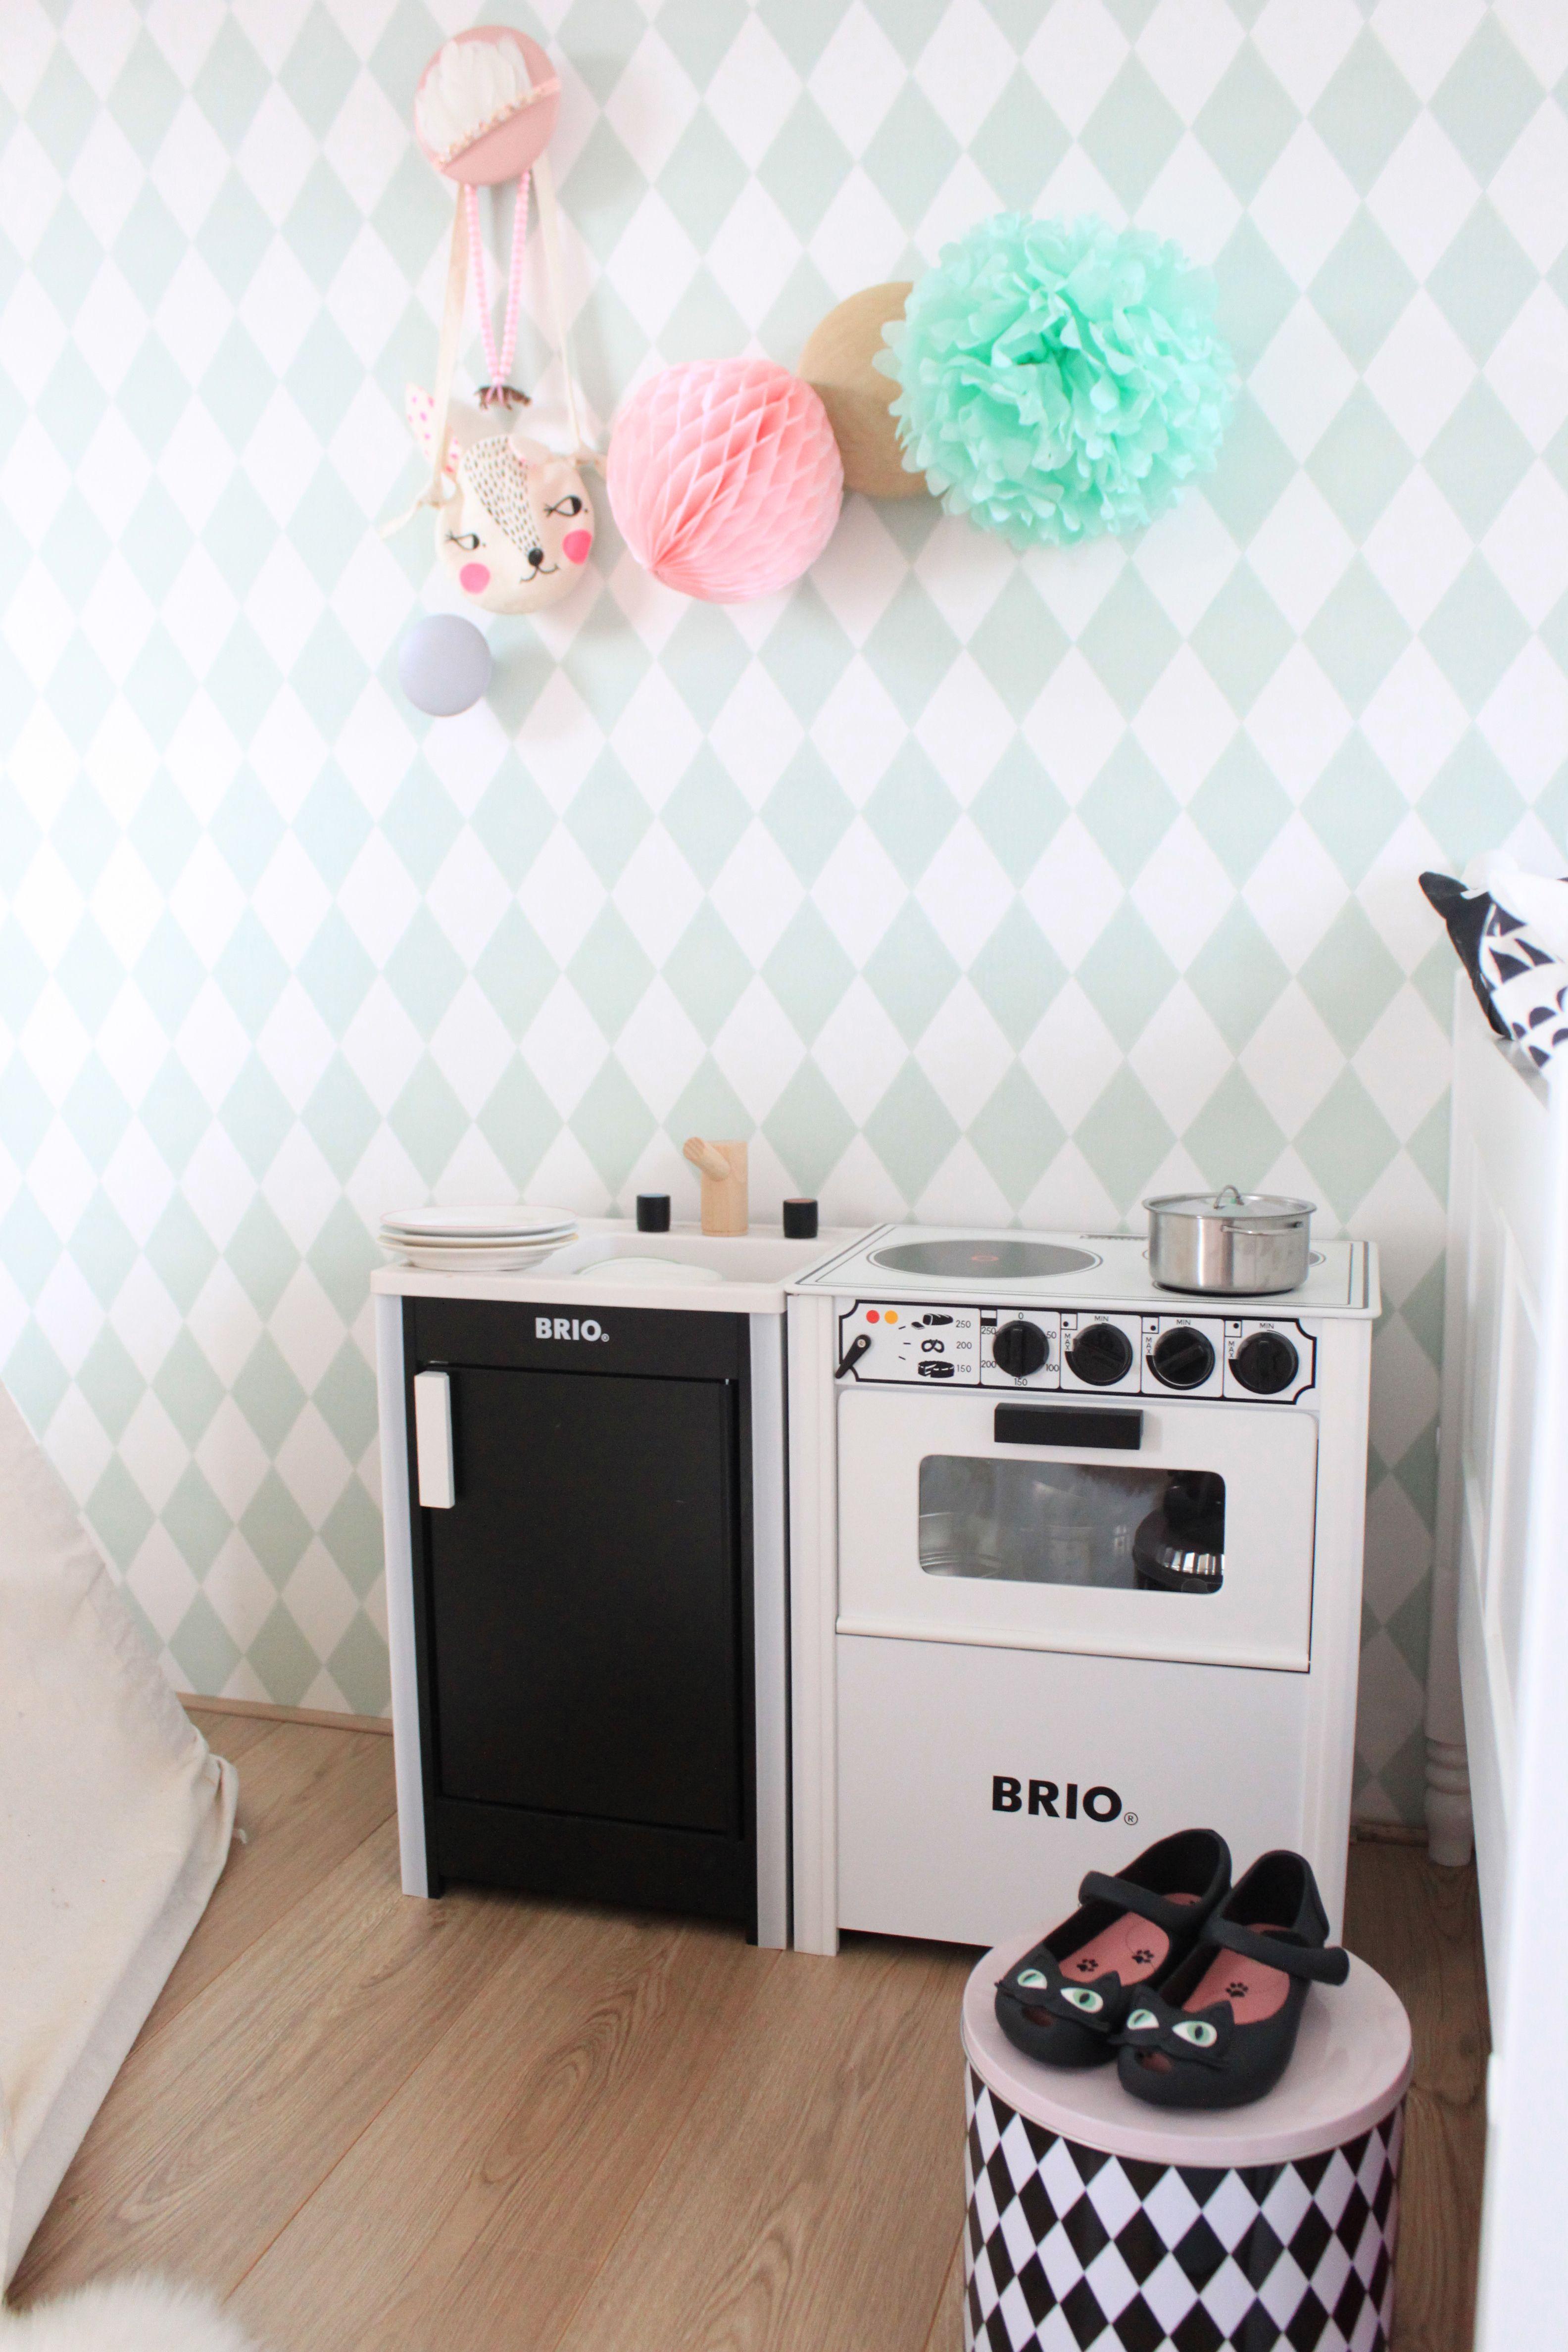 Brio kitchen kids. #kidsstylingmag #eeflillemorstyling | Baby ...